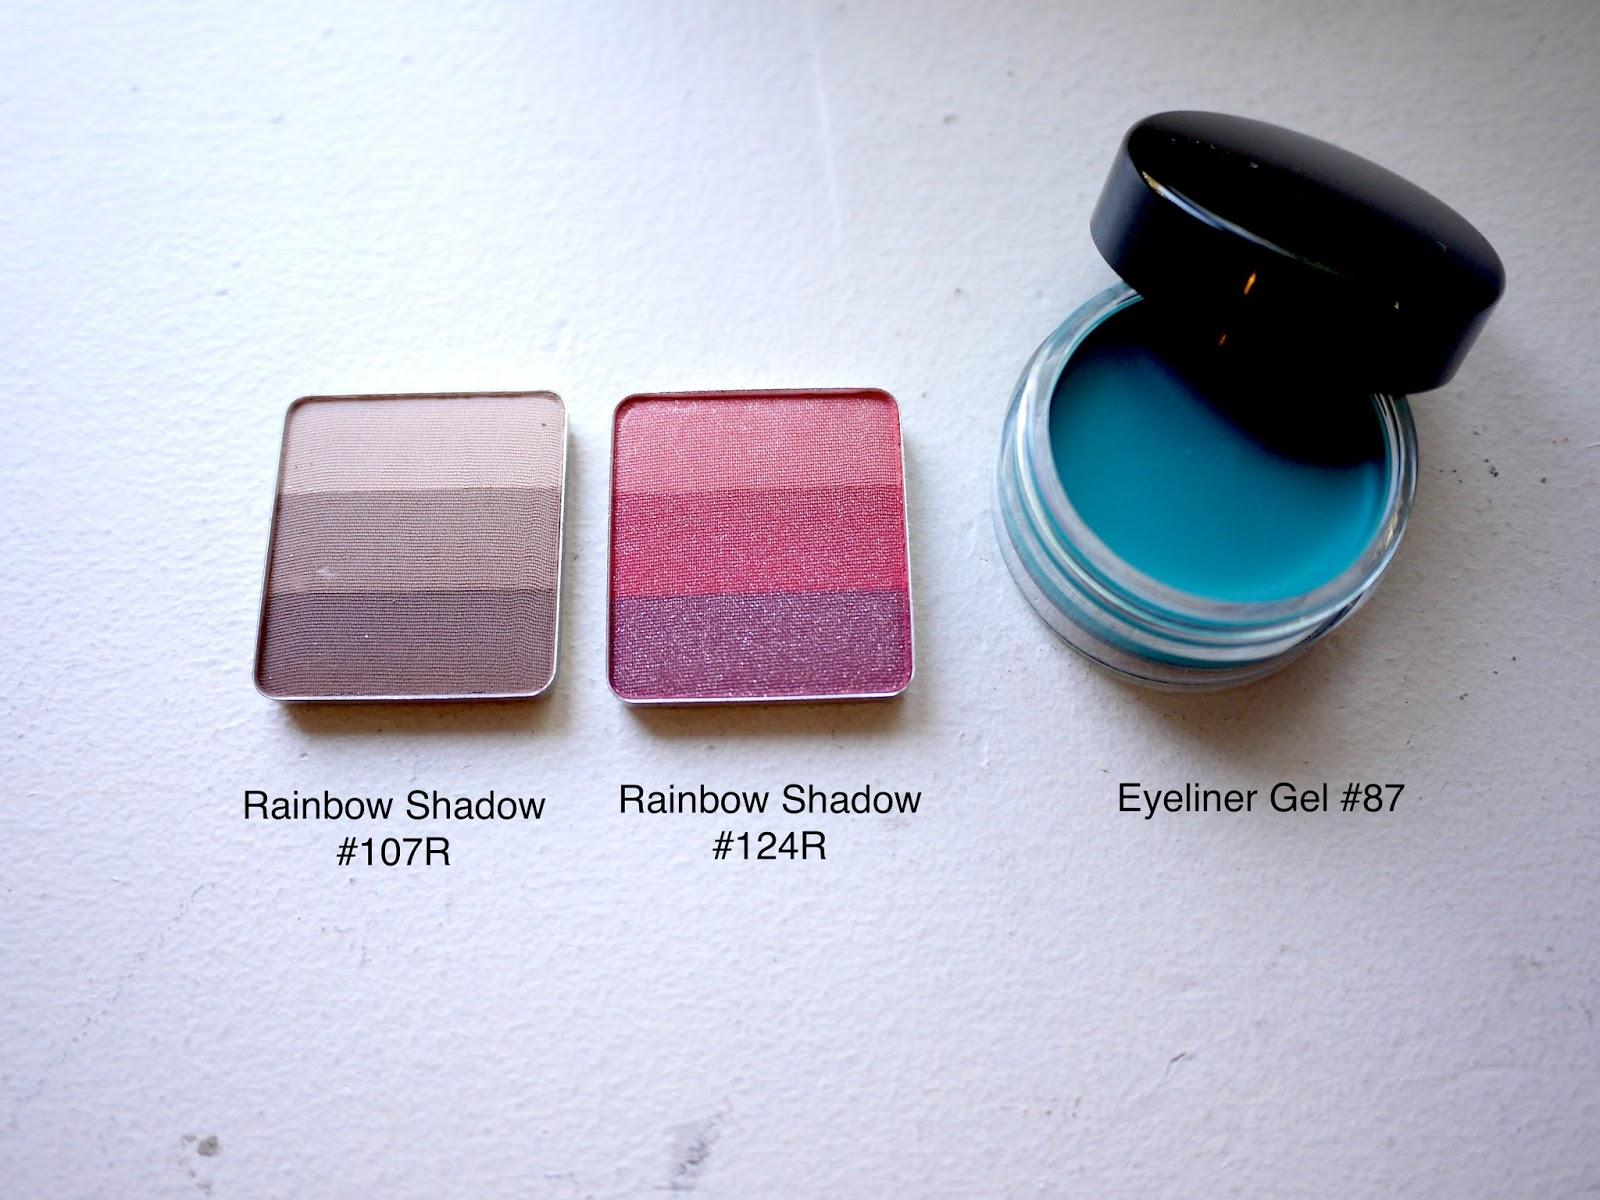 inglot rainbow shadow 107R 124R gel eyeliner 87 swatch